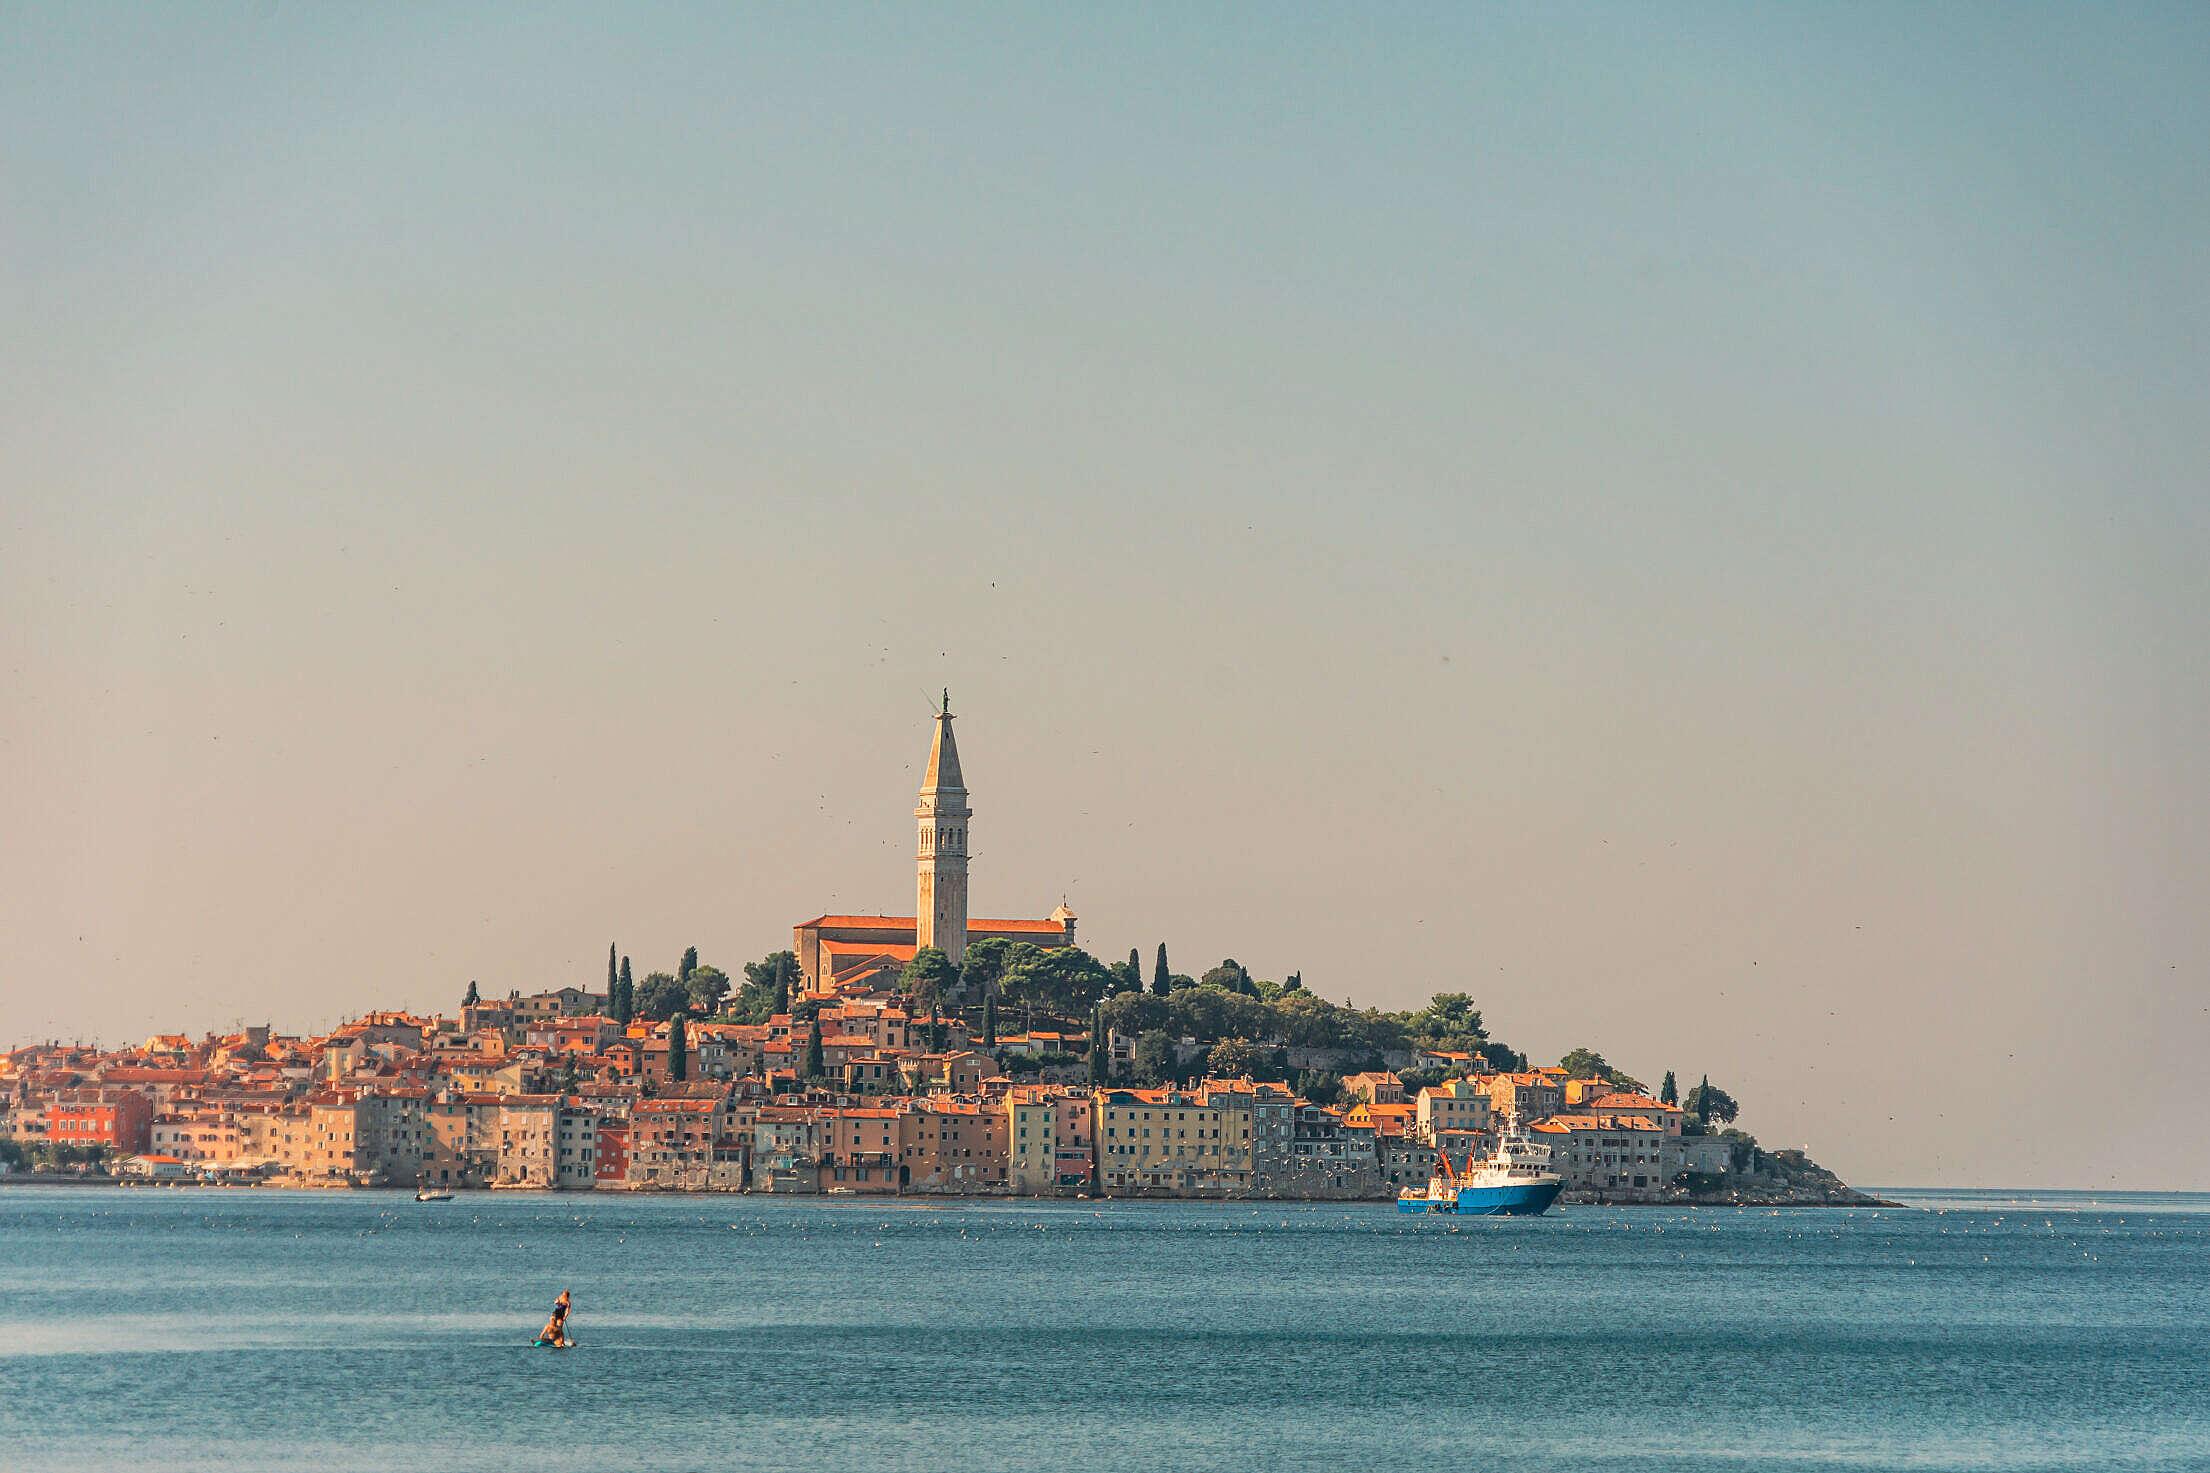 Coastal Town of Rovinj, Istria, Croatia Free Stock Photo